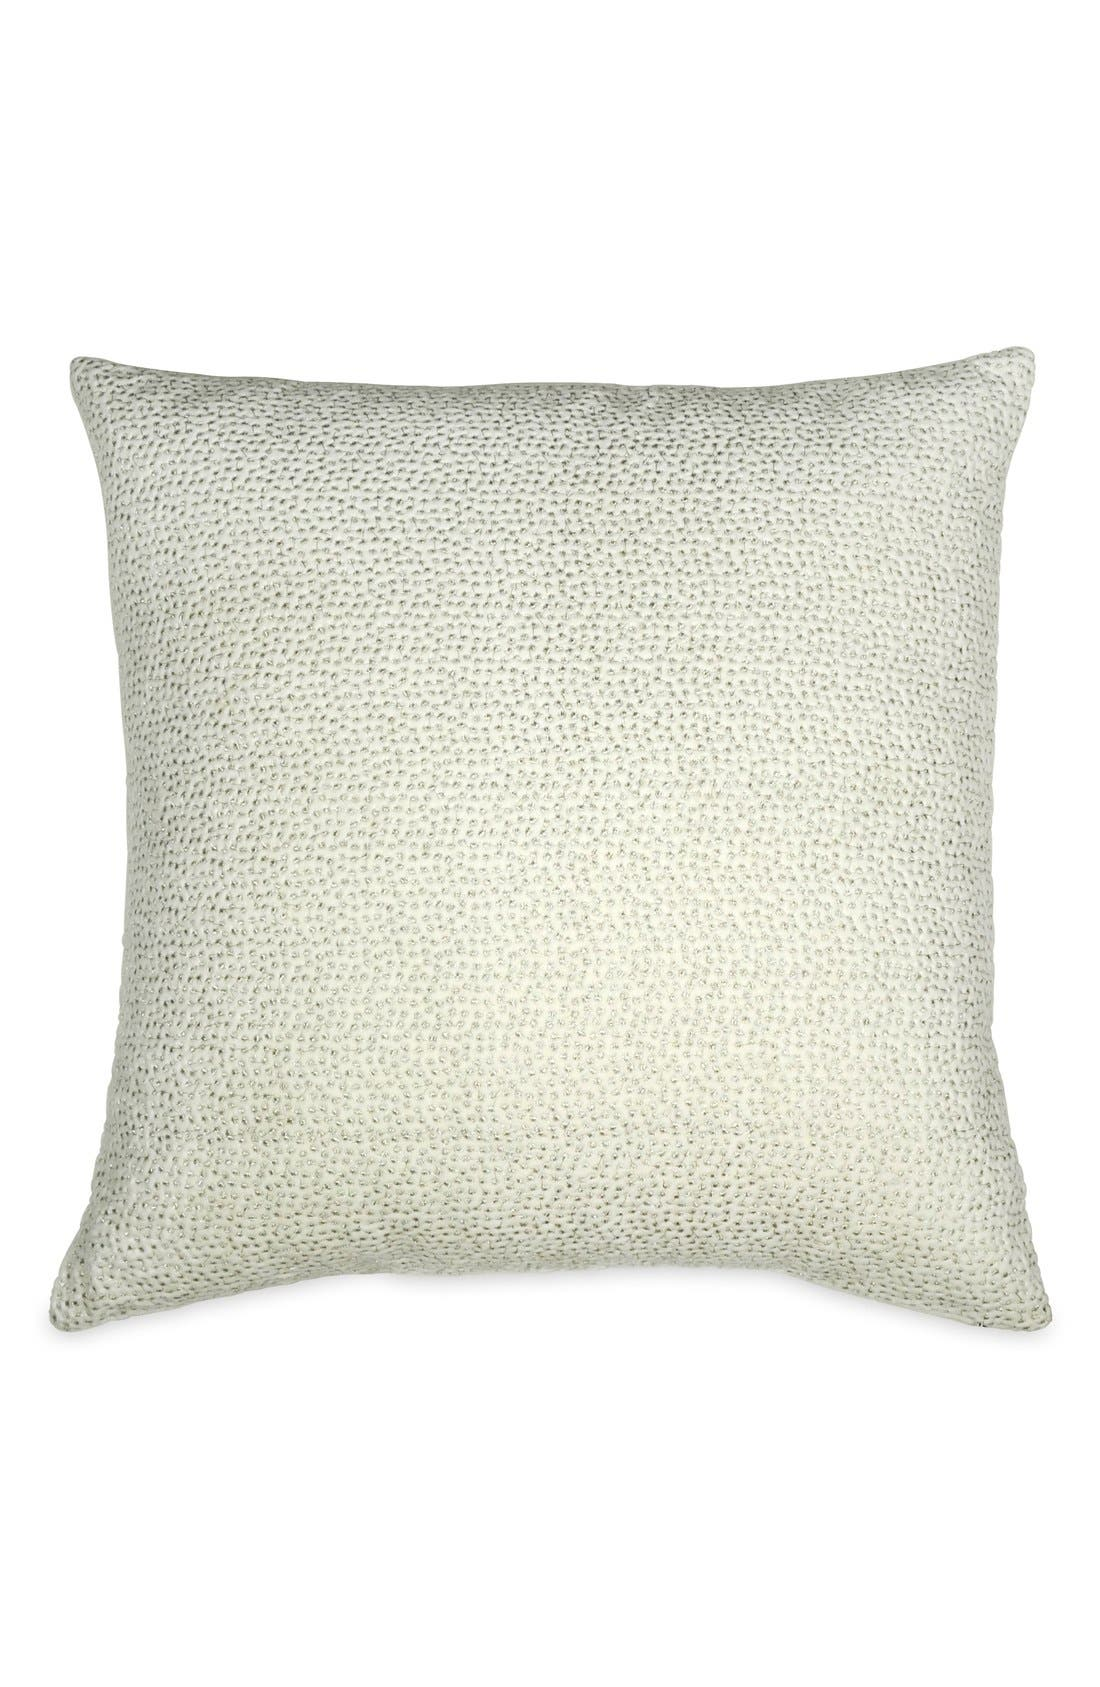 Donna Karan Collection 'Exhale' Pillow